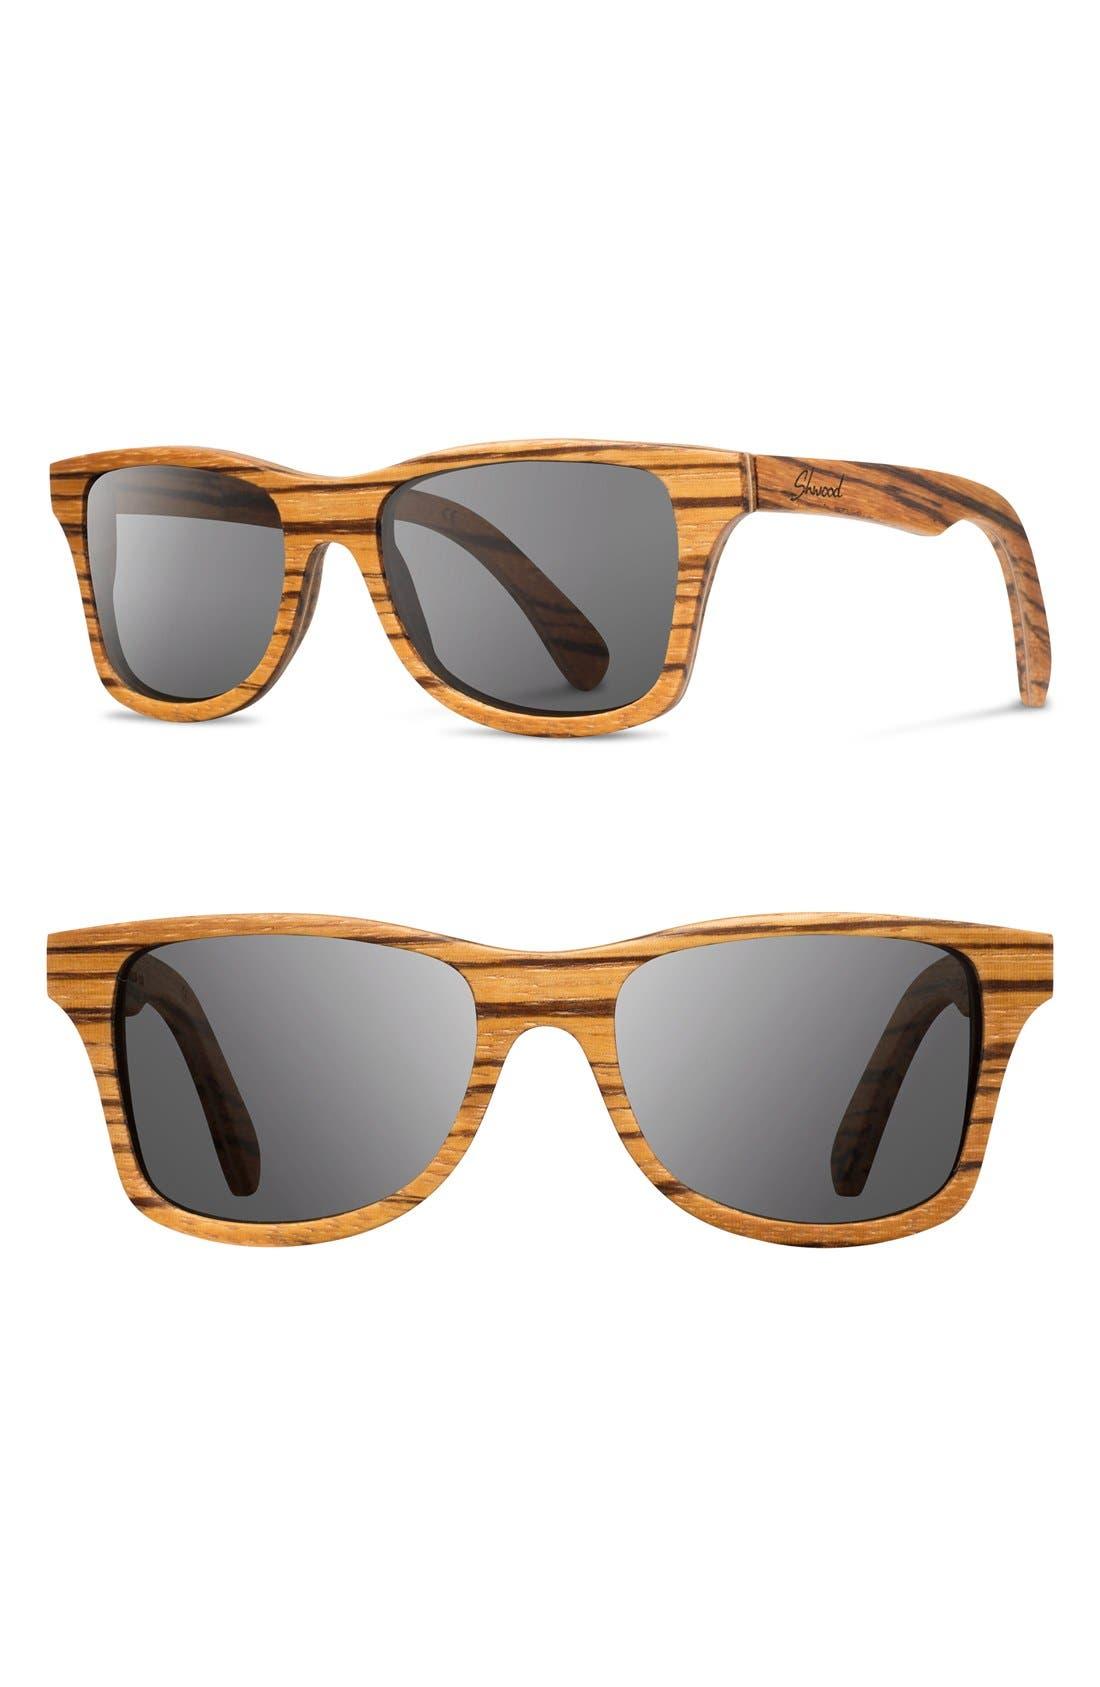 Alternate Image 1 Selected - Shwood 'Canby' 48mm Polarized Sunglasses